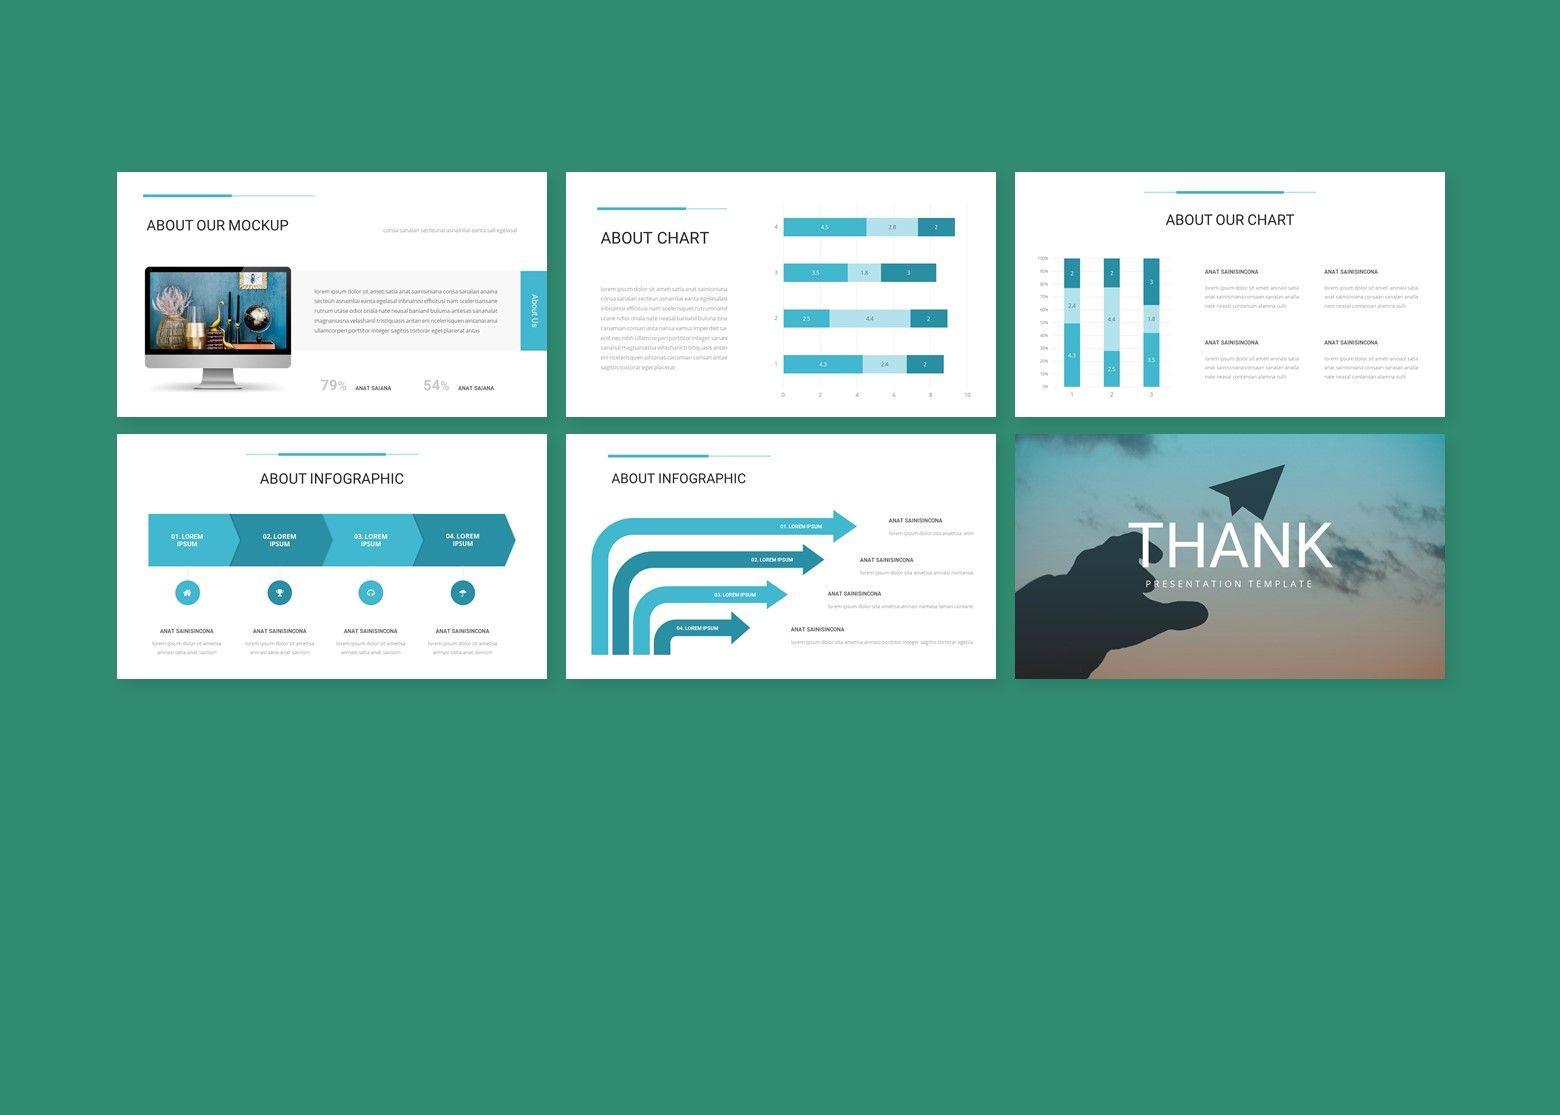 Aion Corporate Google Slides Template, Slide 5, 08151, Business Models — PoweredTemplate.com